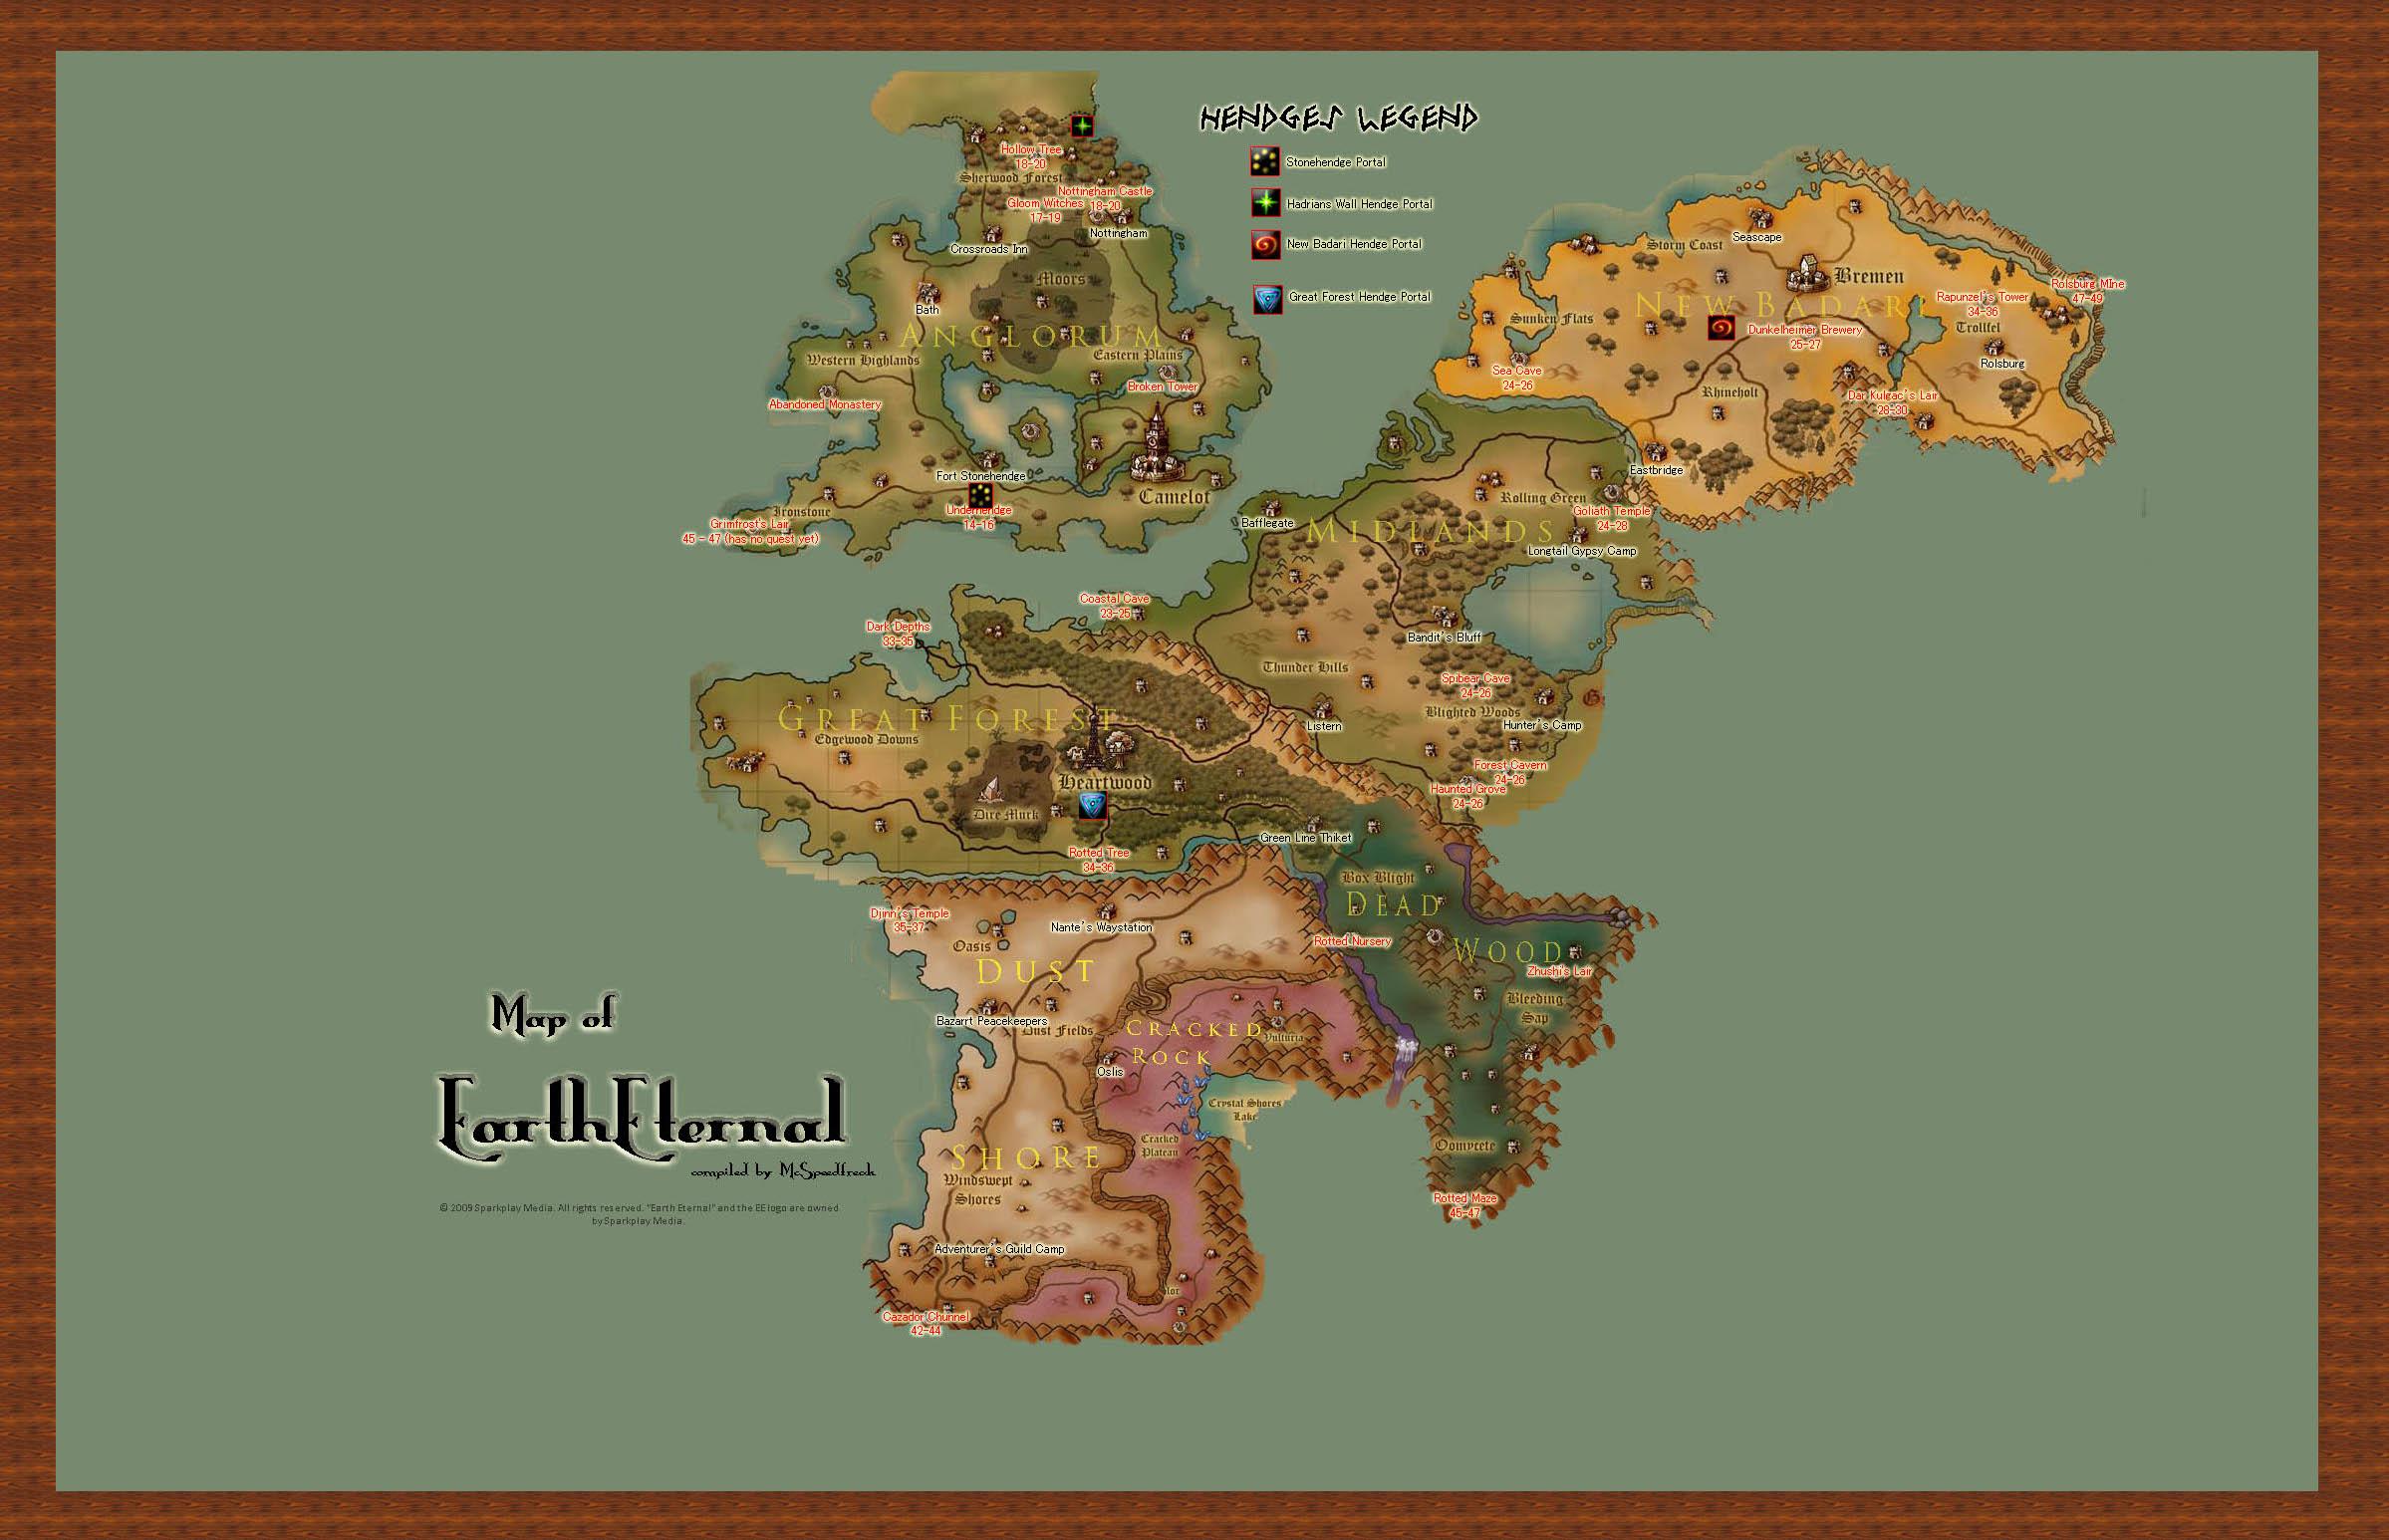 map of earth eternal